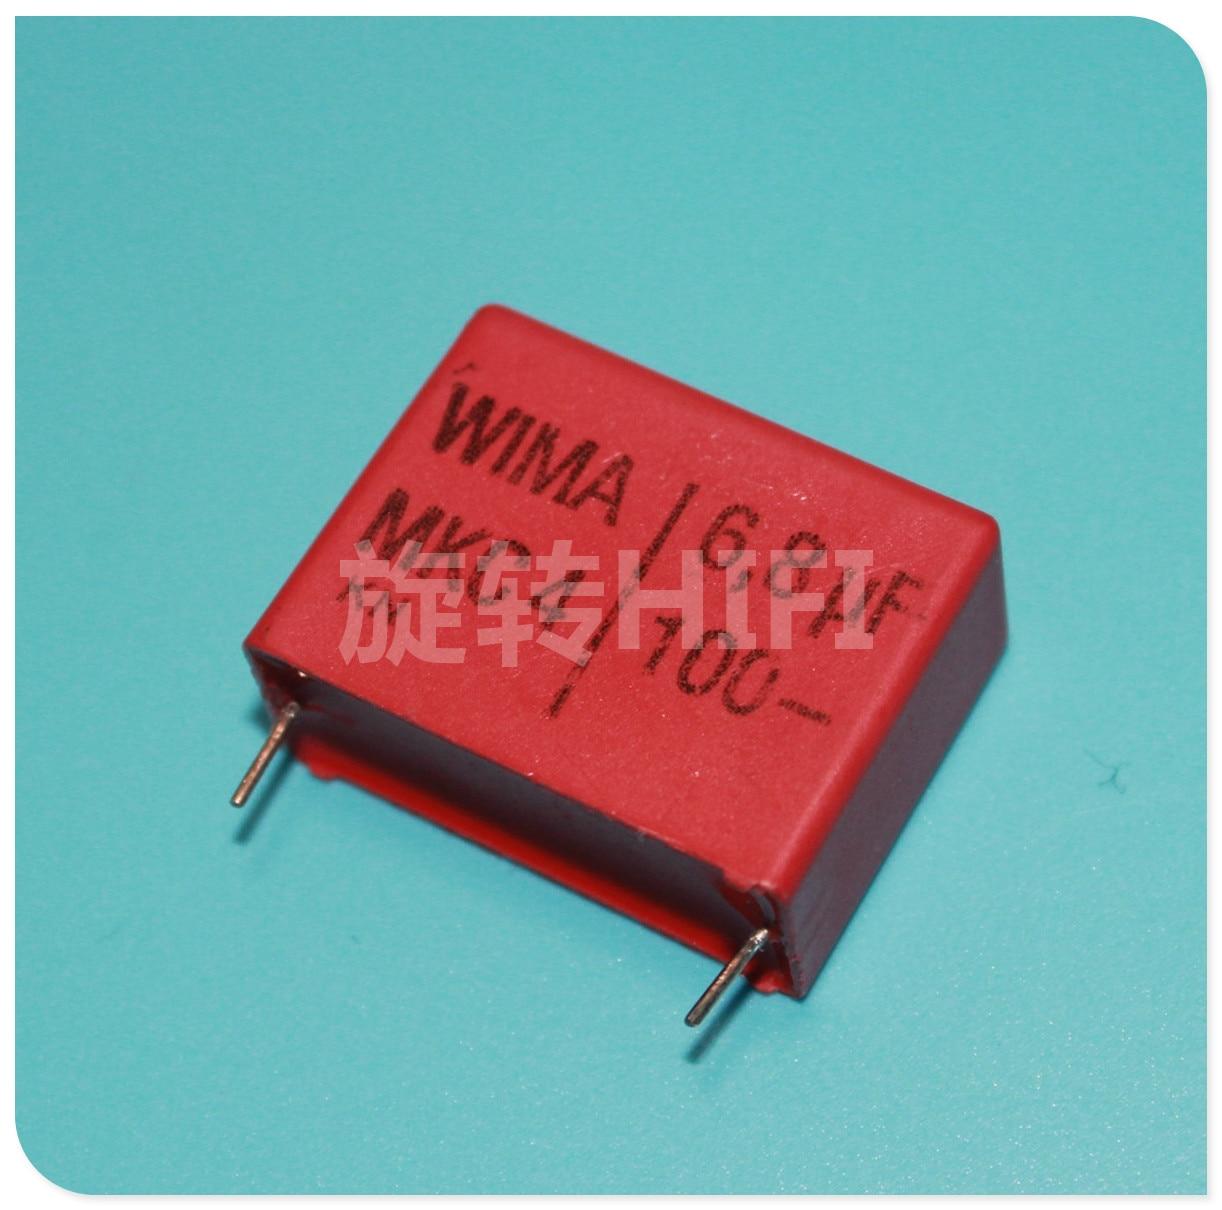 2 uds rojo WIMA MKC4 6,8 UF 100V PCM27.5 original nuevo MKC4 685/100V P27.5mm de audio gran oferta 6,8 uf/100 v 6u8 685